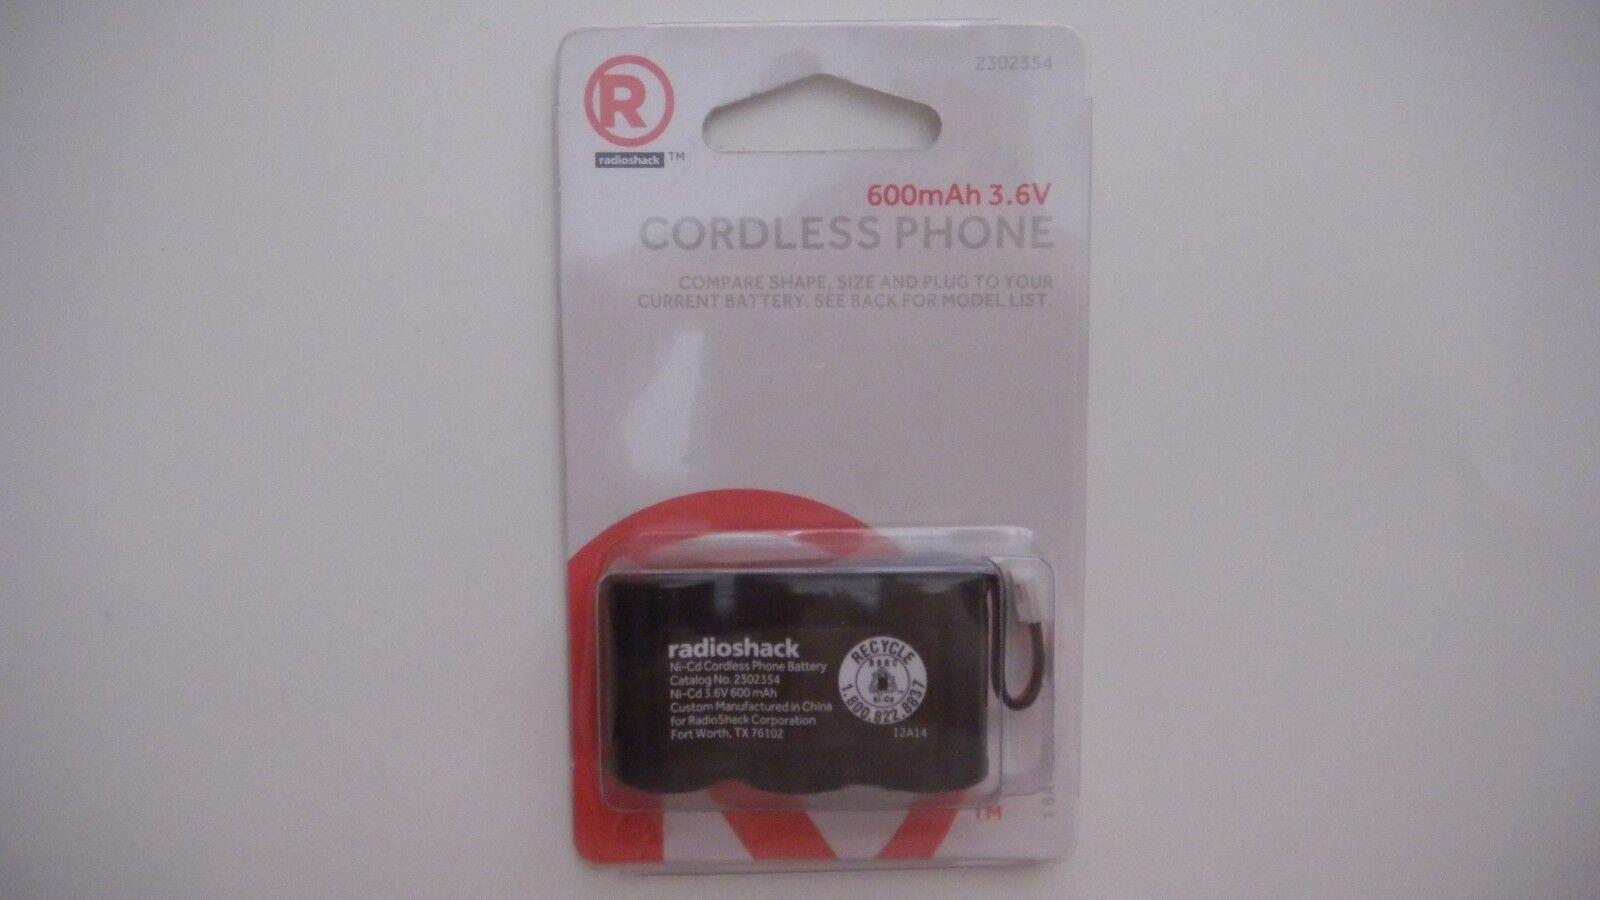 RadioShack Cordless Phone Battery  600mAh 3.6V Ni-Cd  230-23